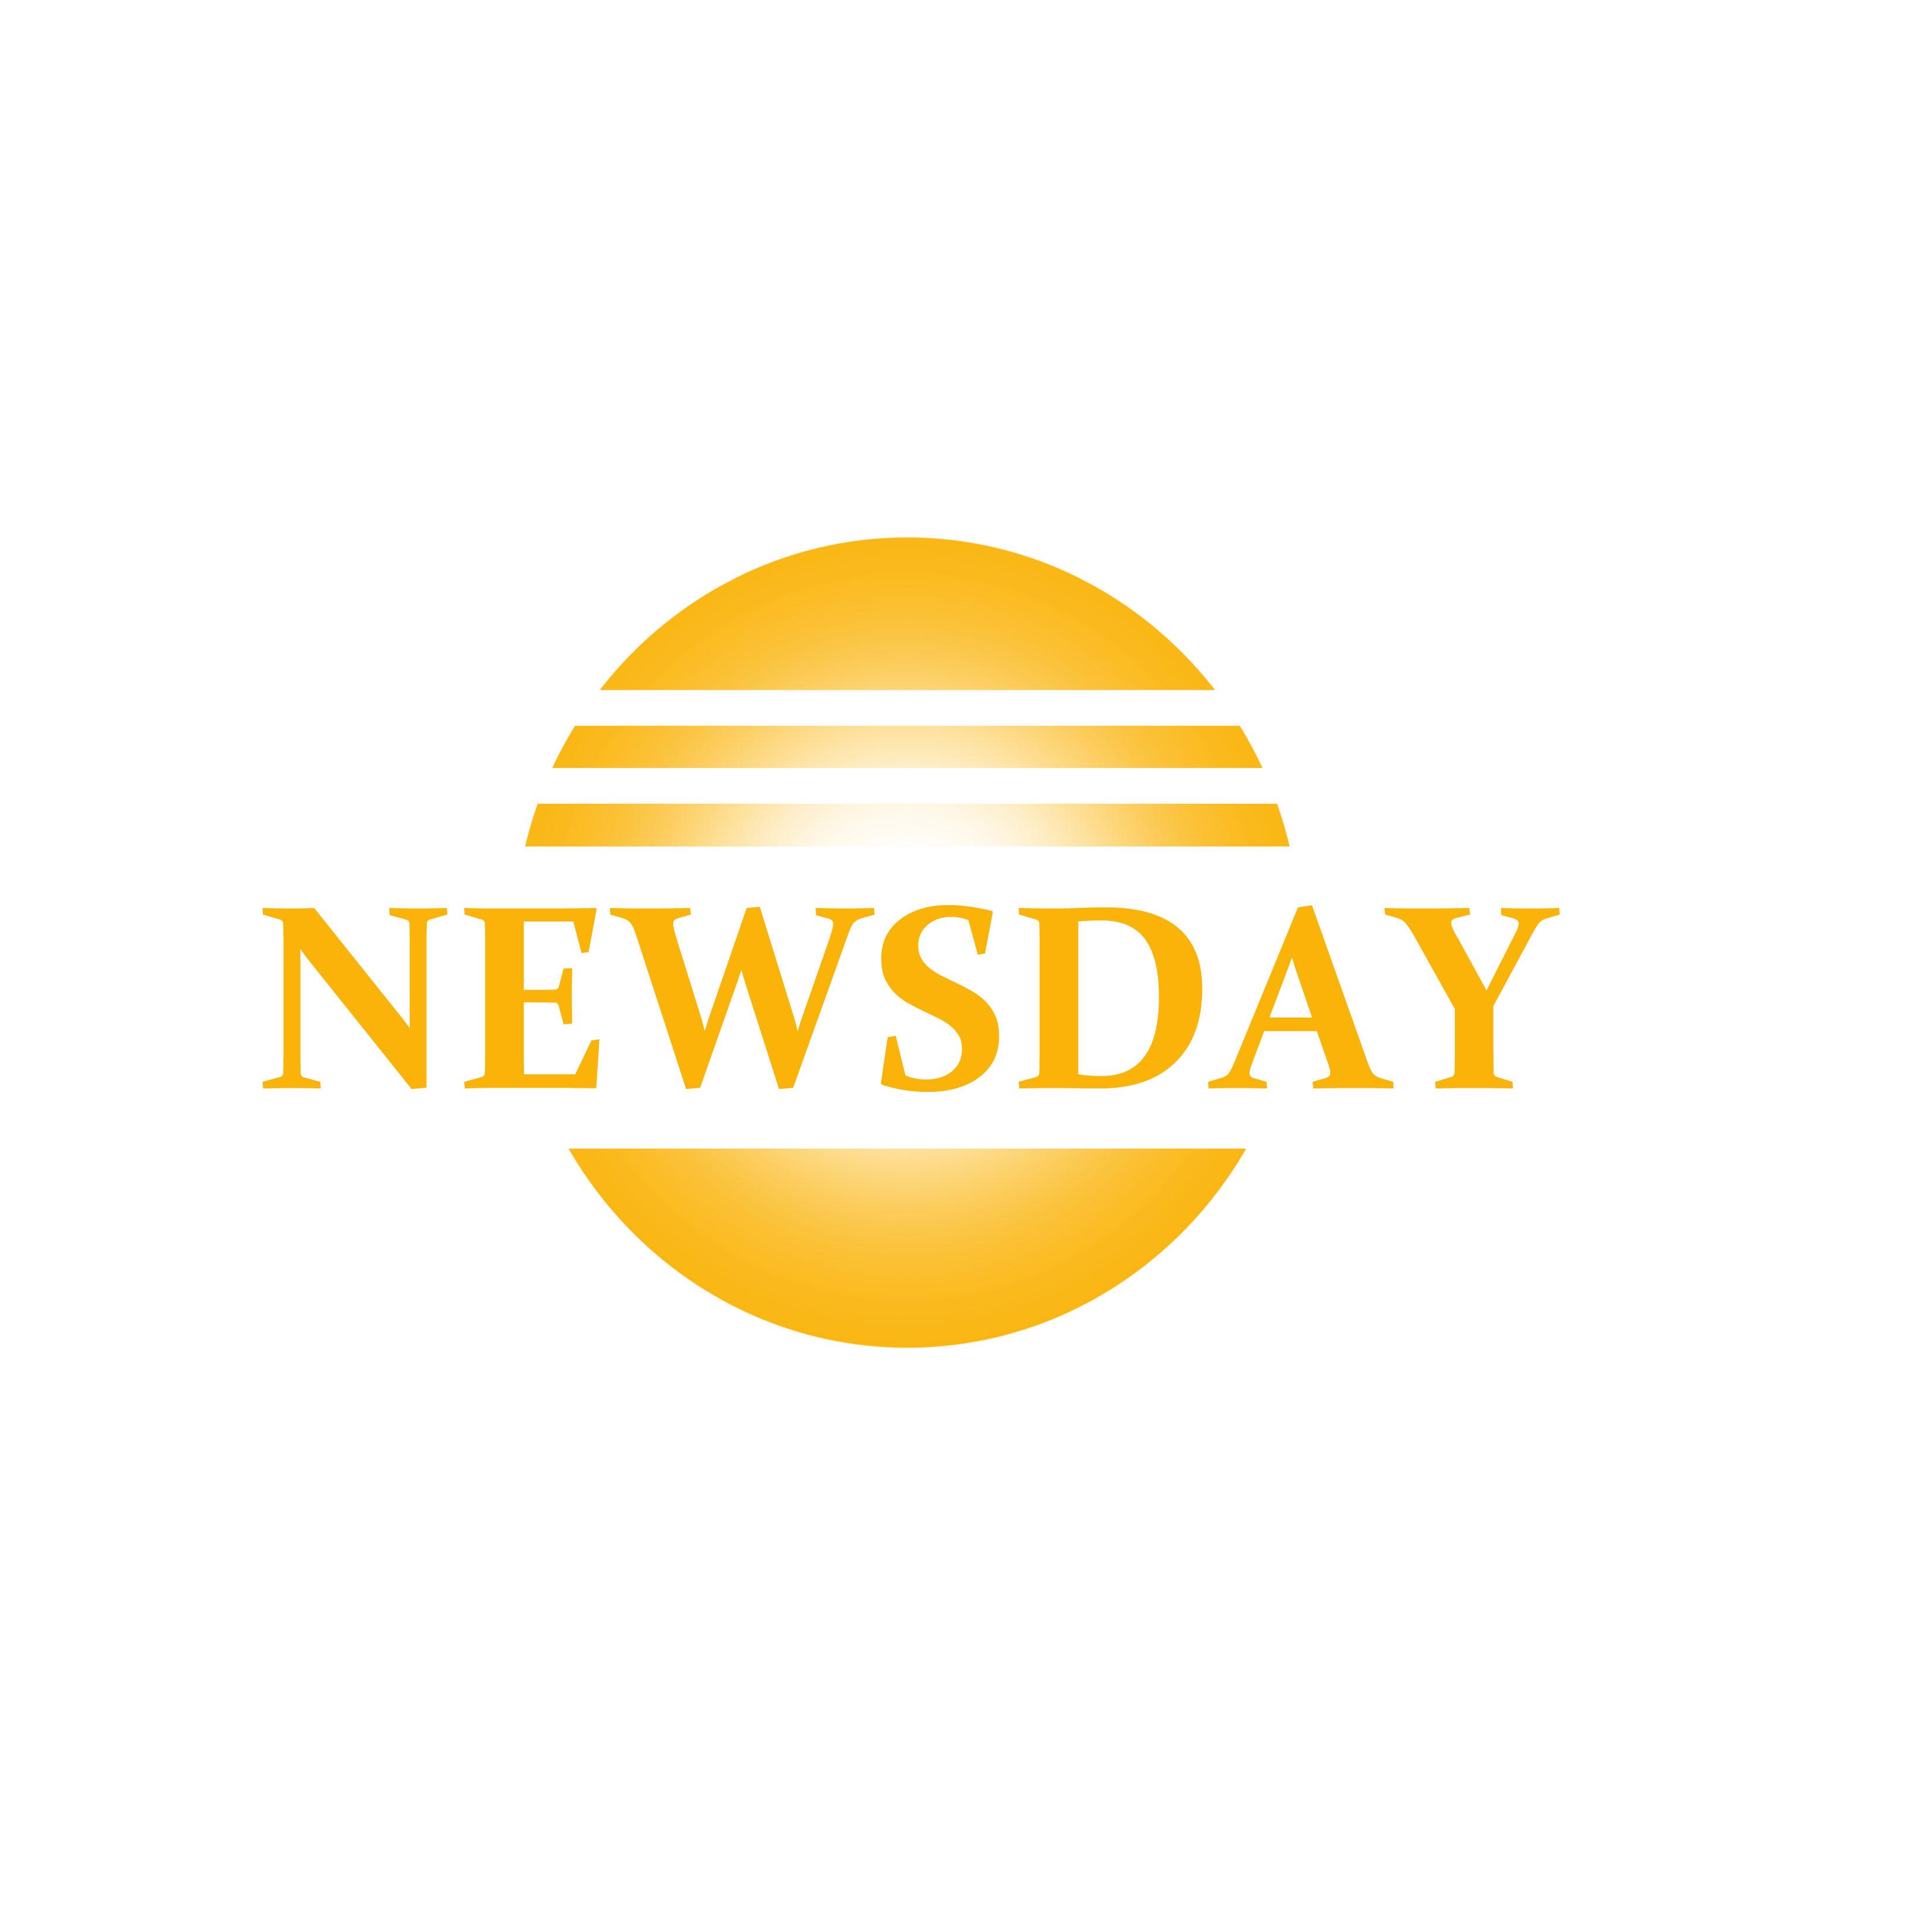 Logo Design by Allan Esclamado - Entry No. 44 in the Logo Design Contest Artistic Logo Design for Newsday.